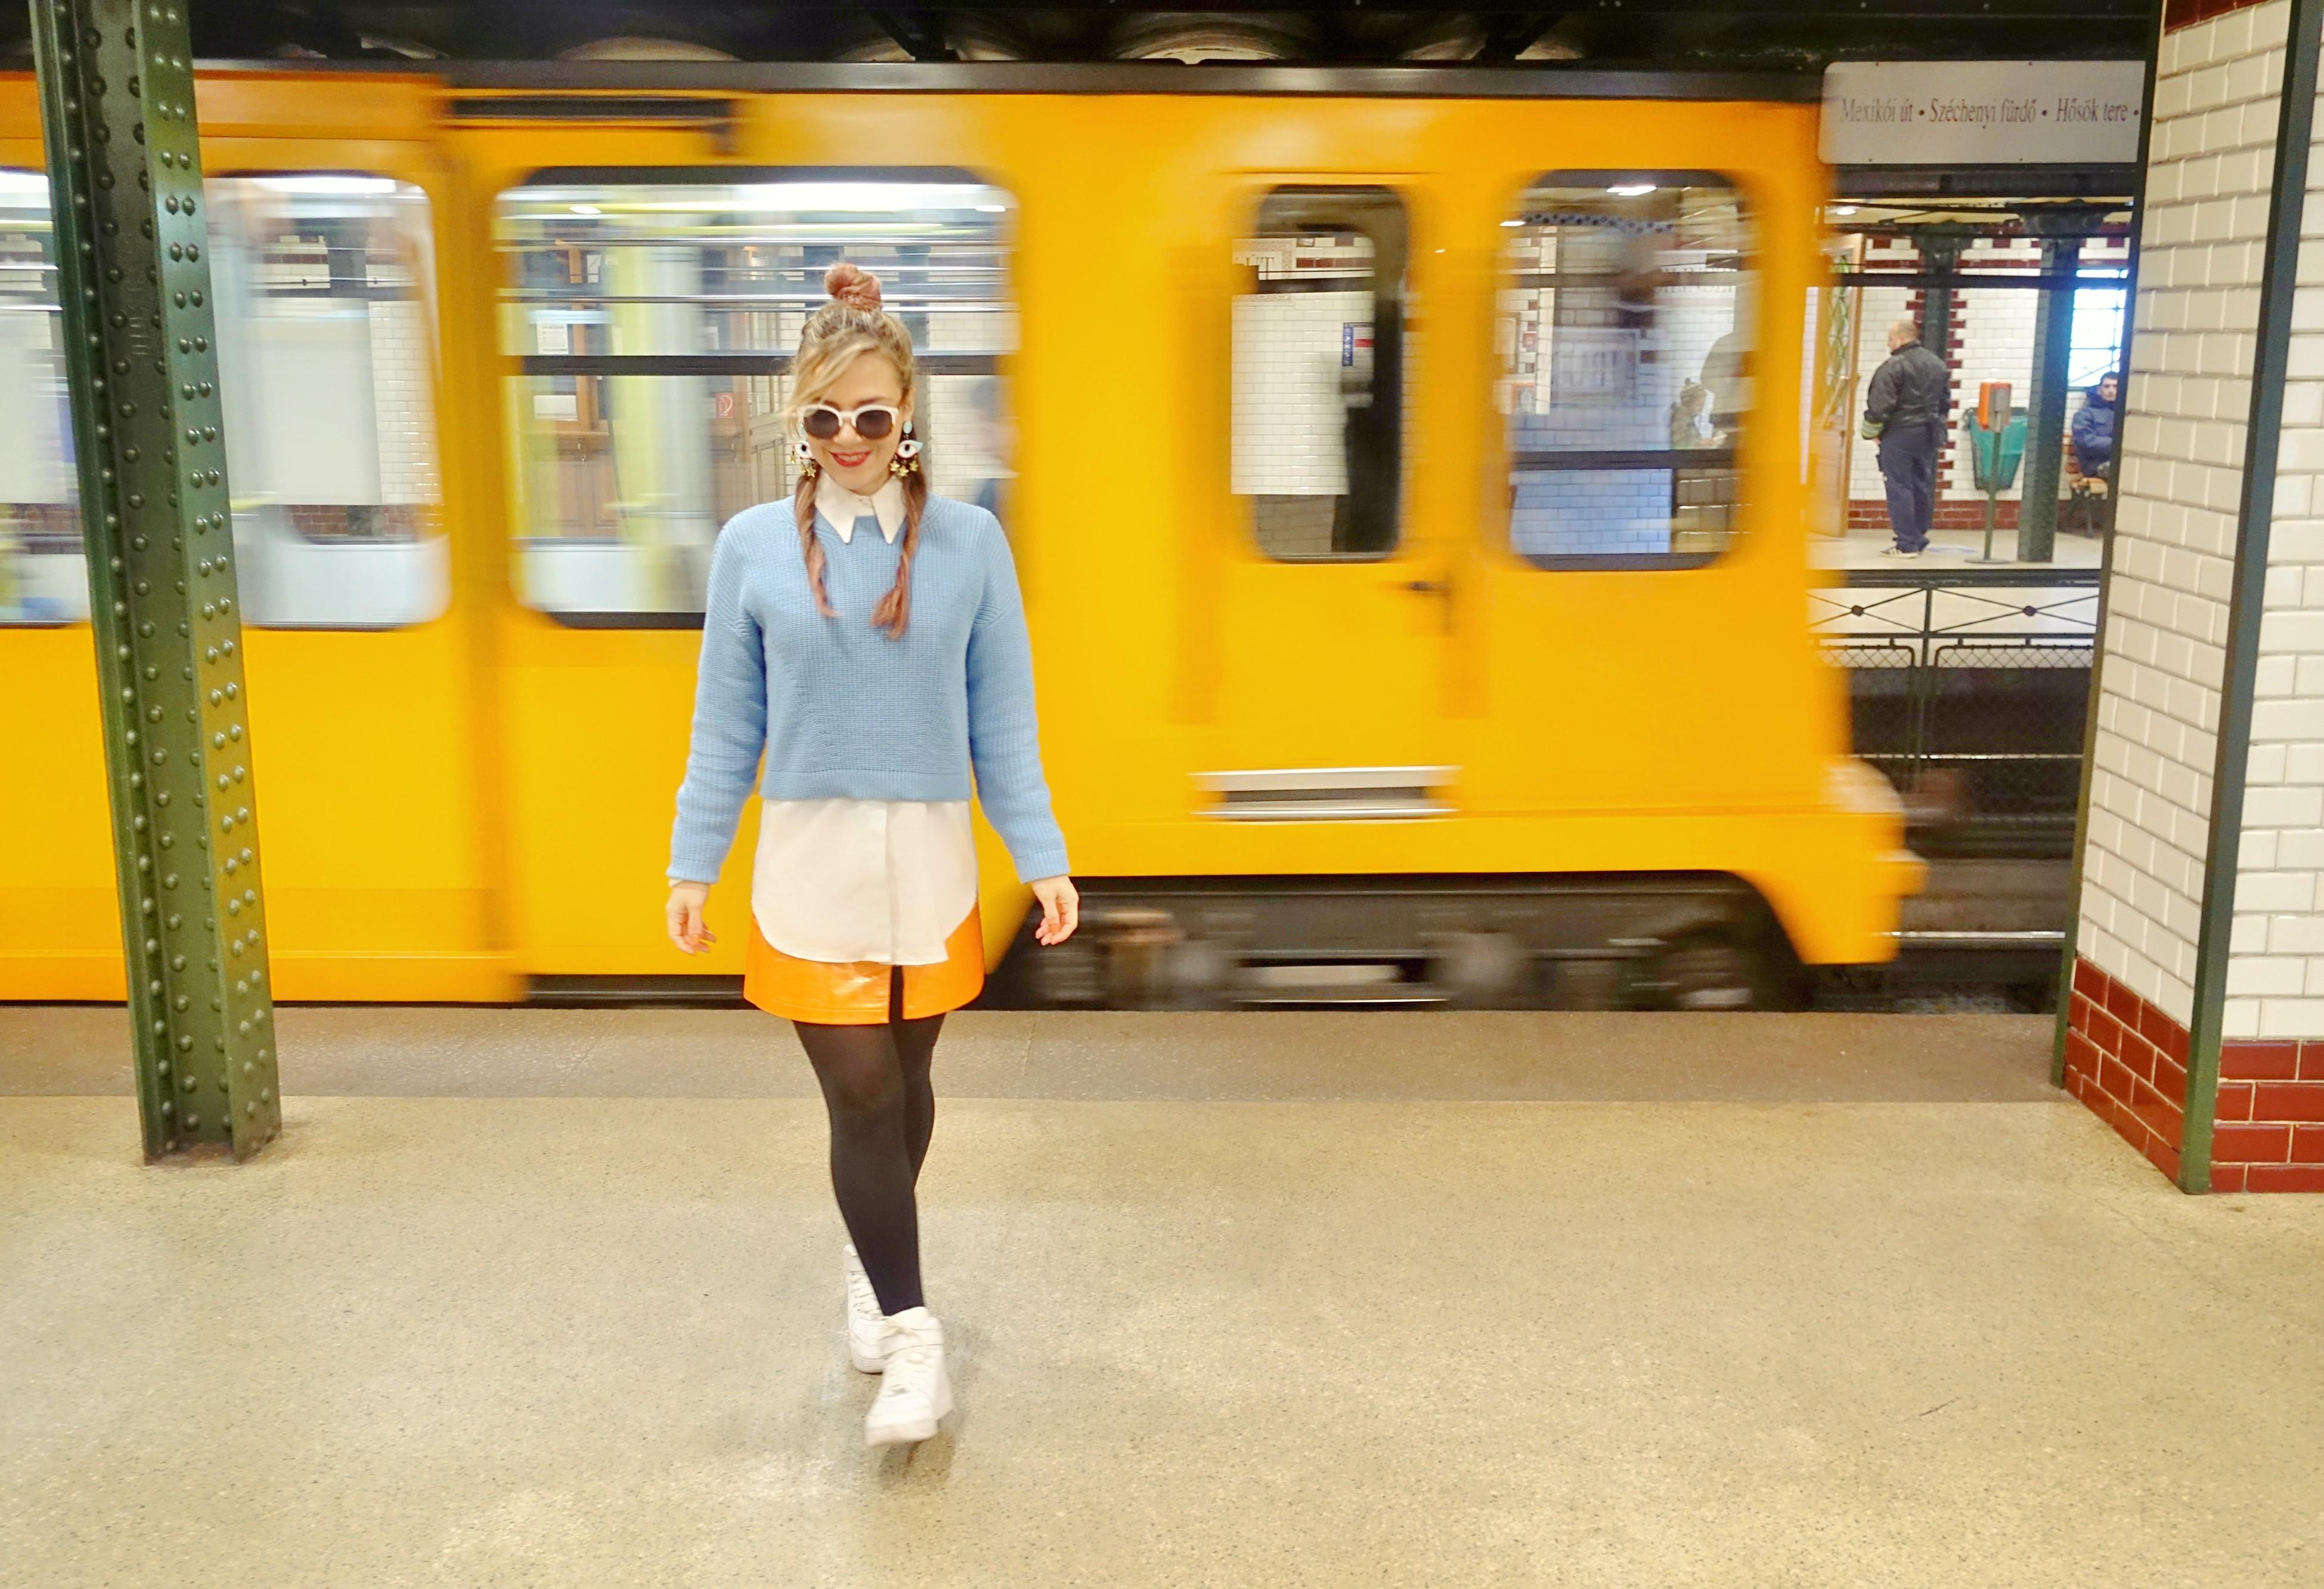 Falda-naranja-kling-blog-de-moda-ChicAdicta-fashionista-influencer-metro-budapest-zapatillas-blancas-chic-adicta-PiensaenChic-Piensa-en-Chic